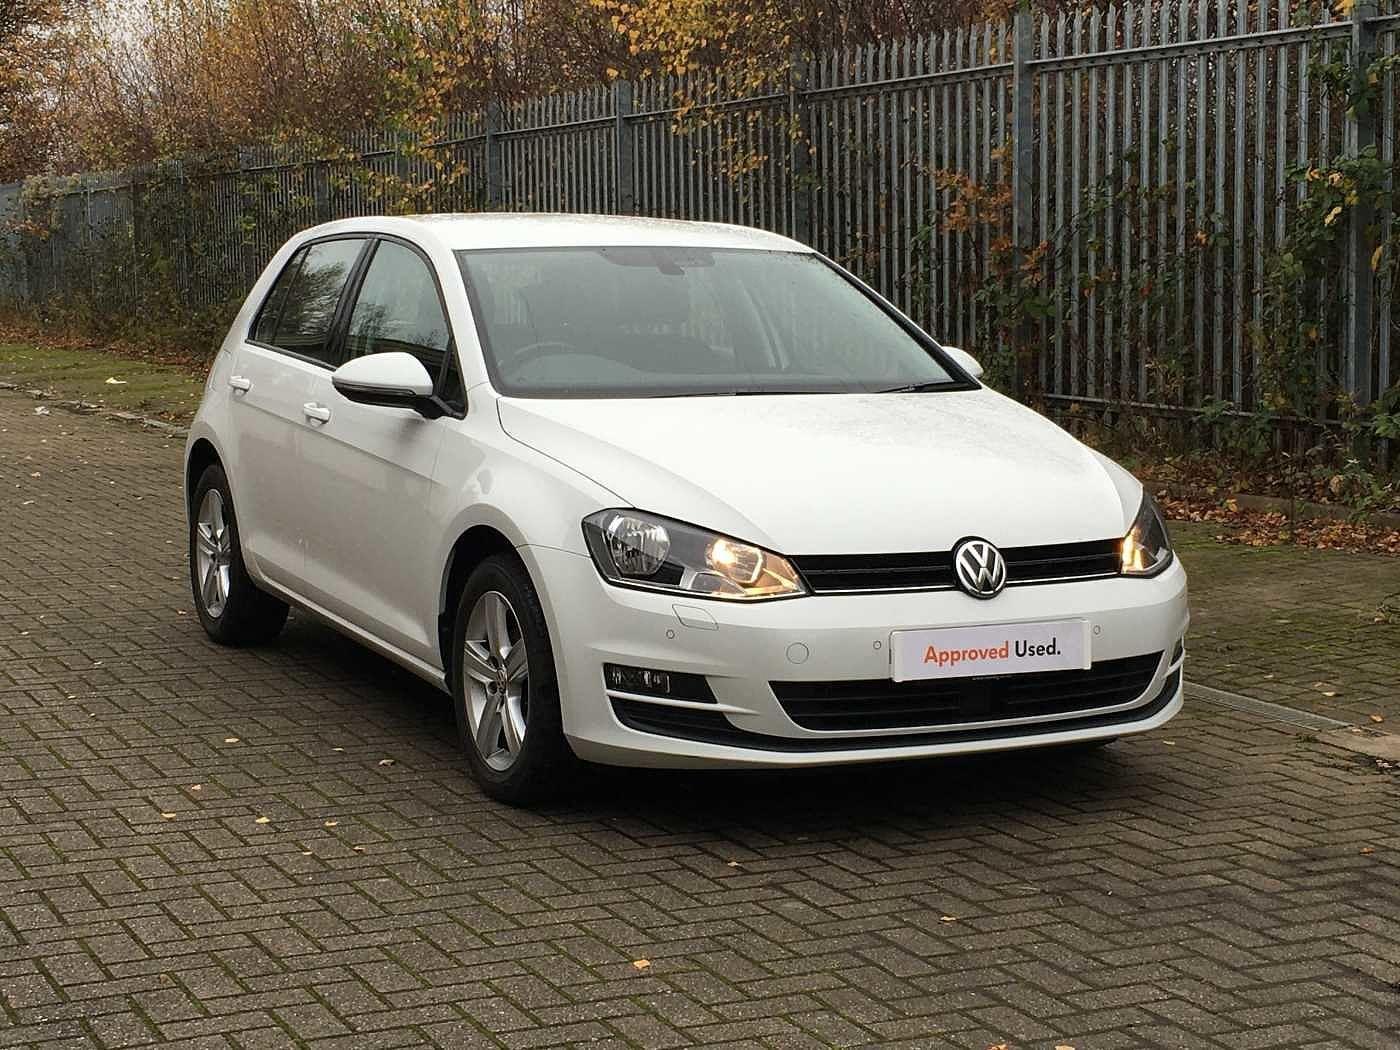 Volkswagen Golf 1.6 TDI 110 Match Edition 5dr DSG